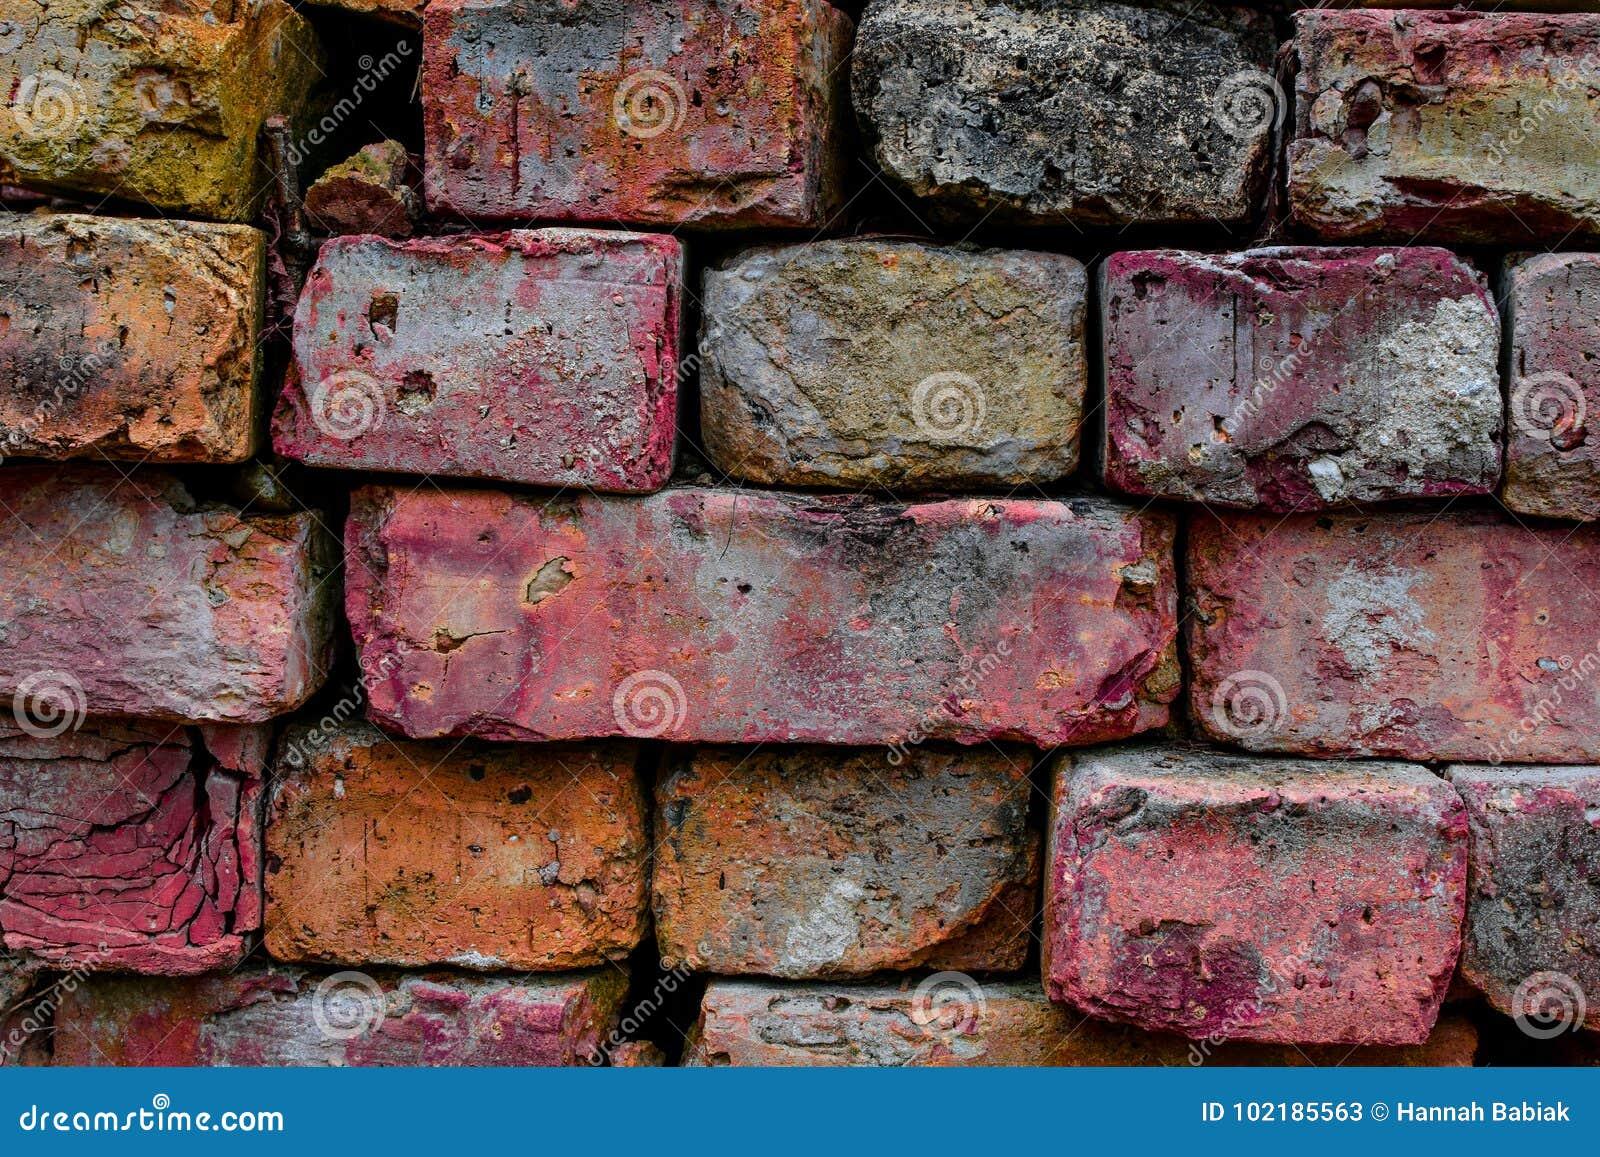 Colored Brick Background